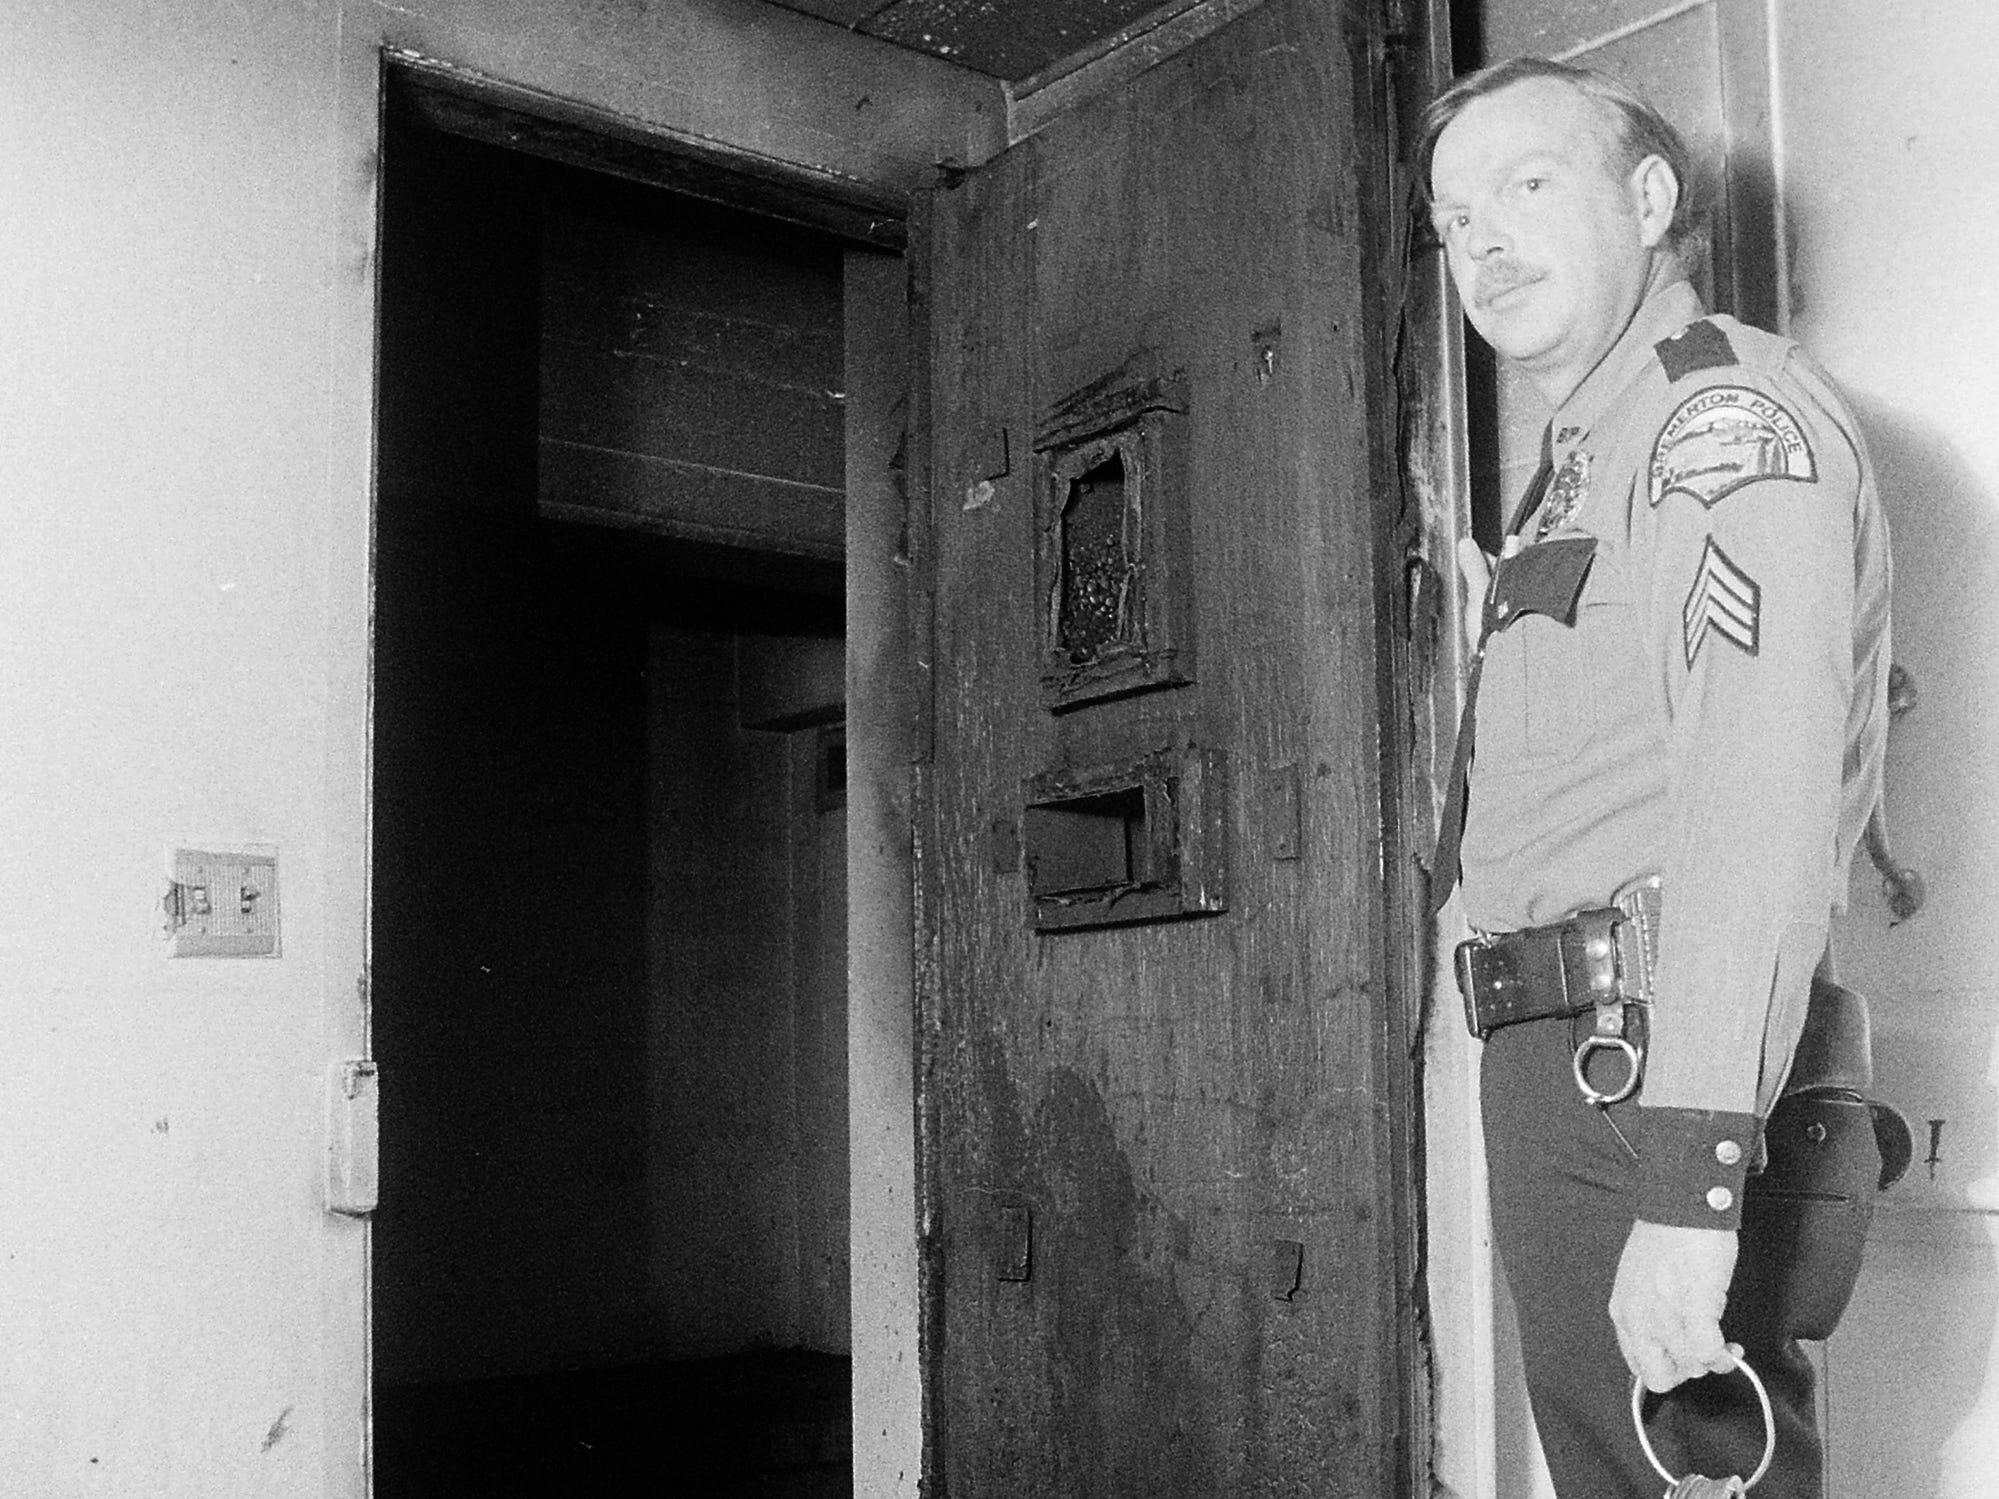 10/08/82City Jail Arson